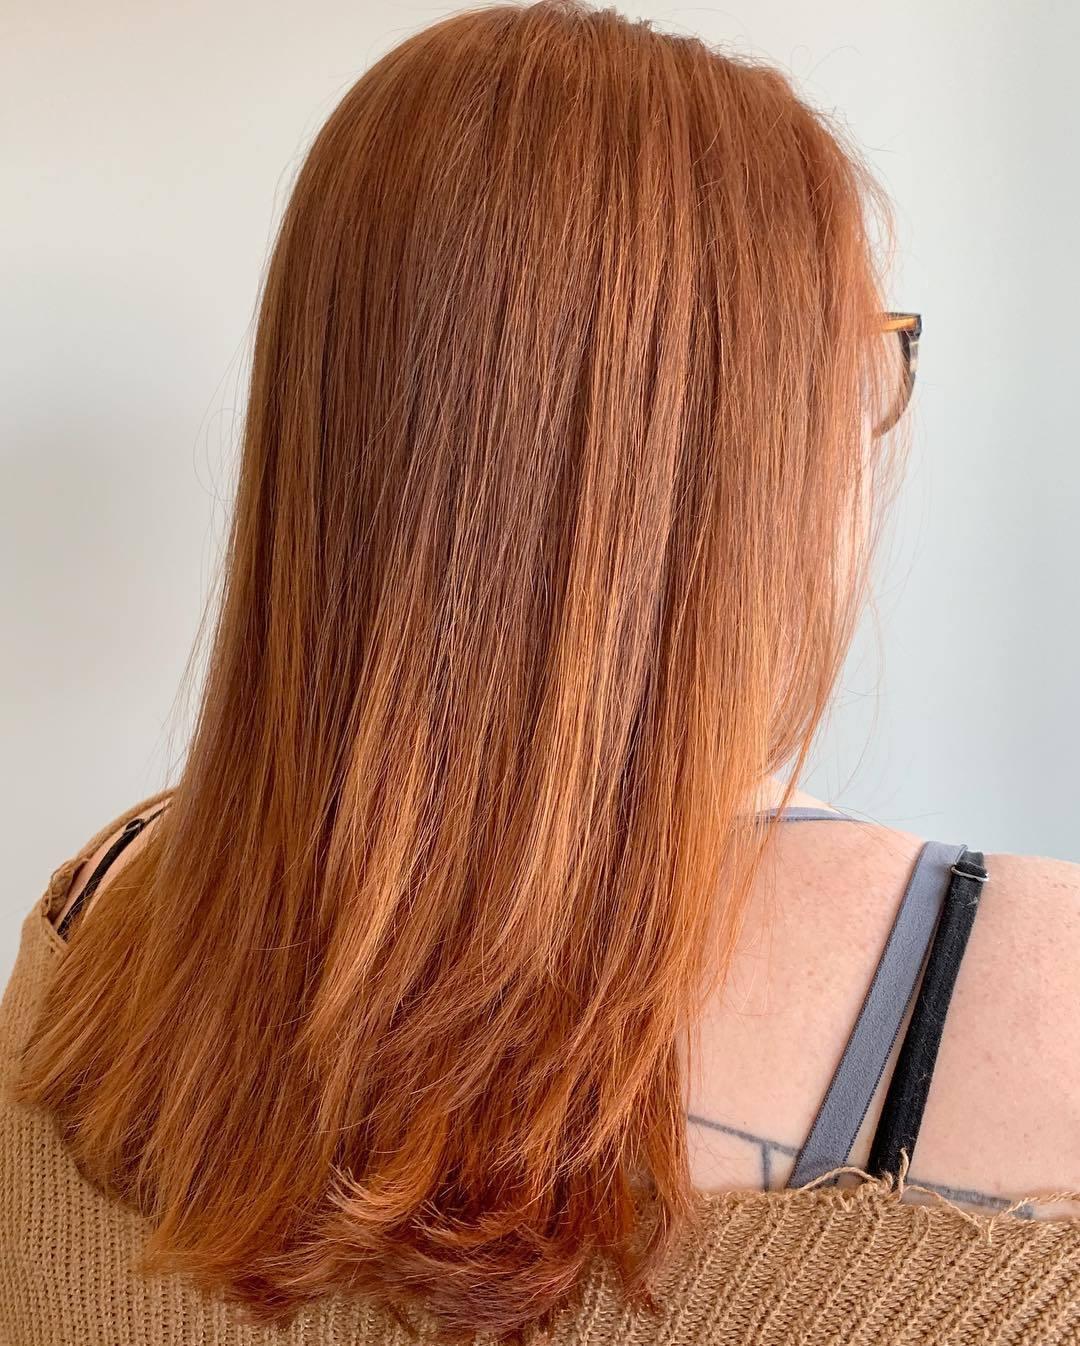 Woman with light pumpkin spice hair